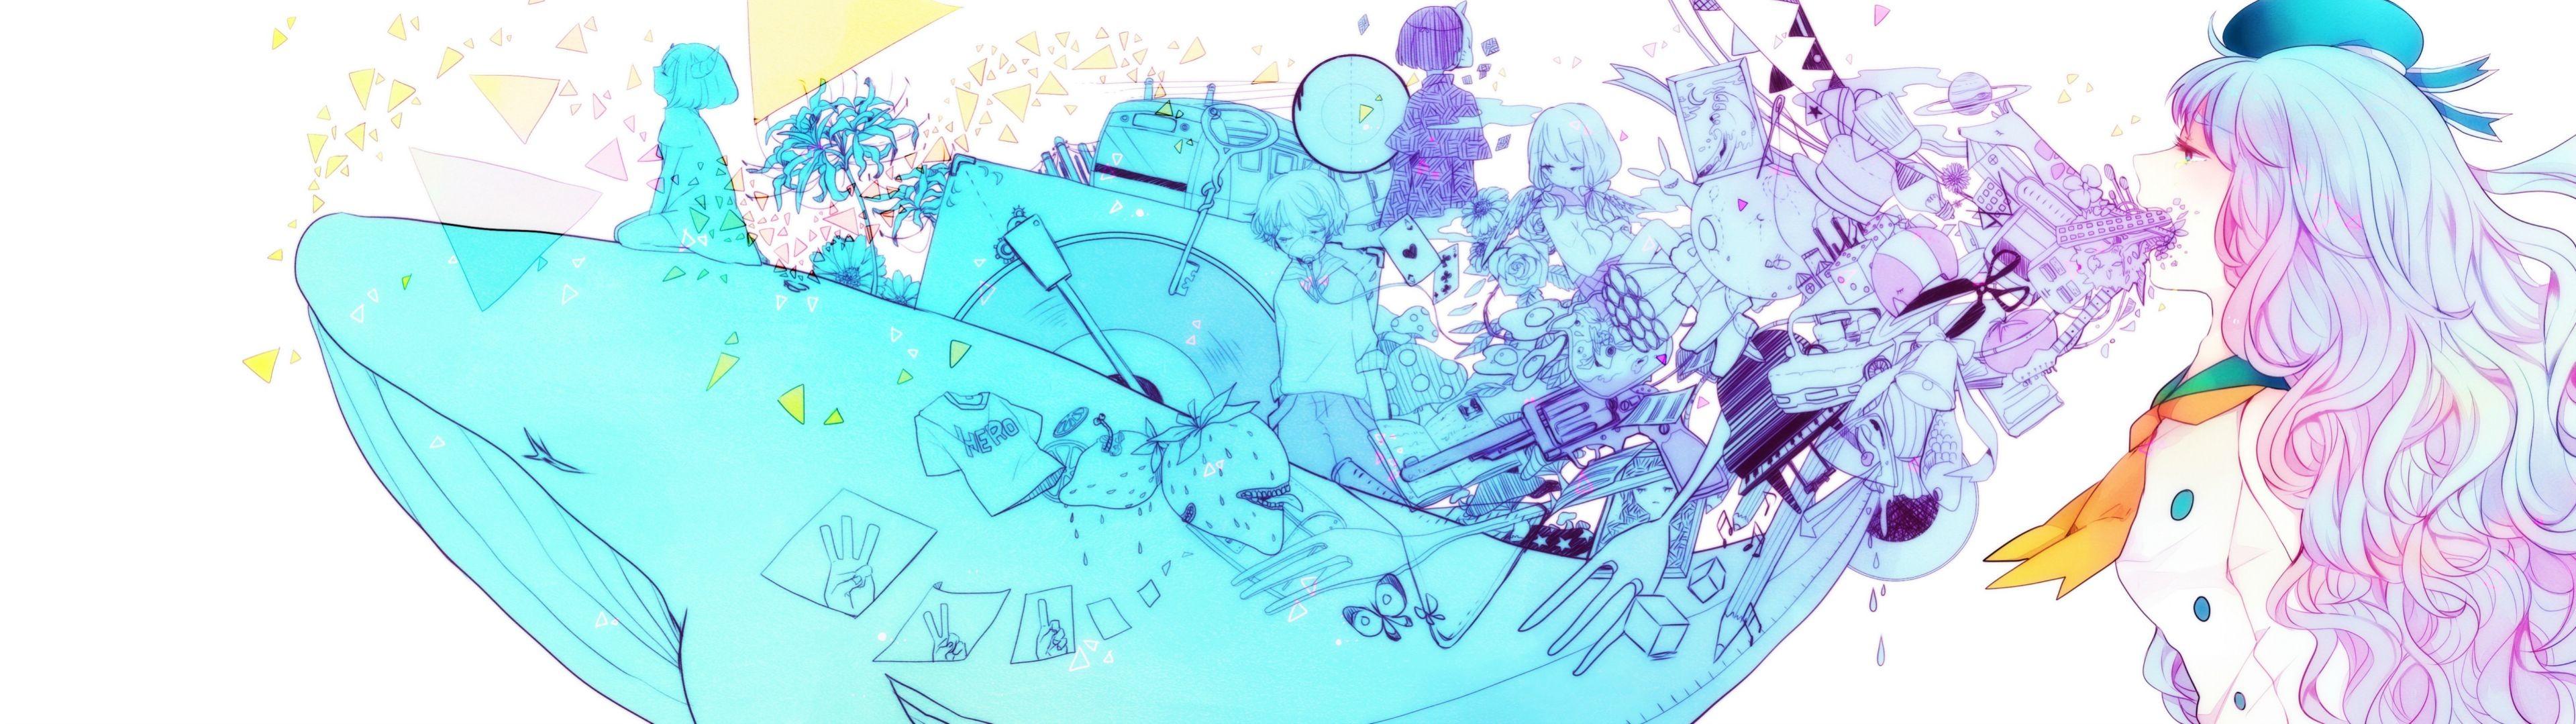 Wallpaper Gambar Ilustrasi Gadis Anime Ikan Paus